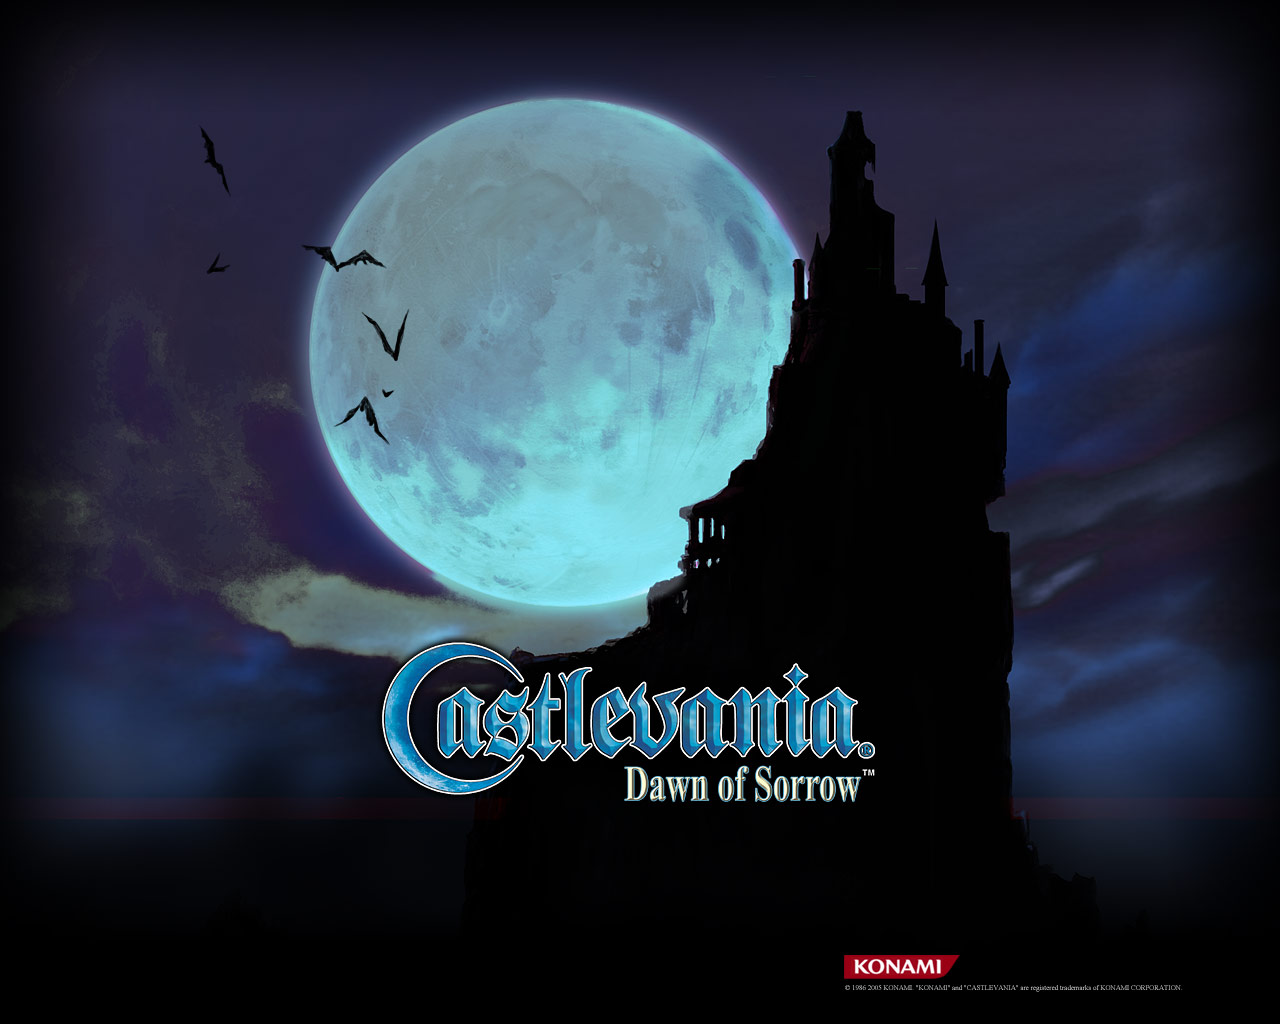 Castlevania Dawn Of Sorrow HD Wallpaper 15   1280 X 1024 stmednet 1280x1024